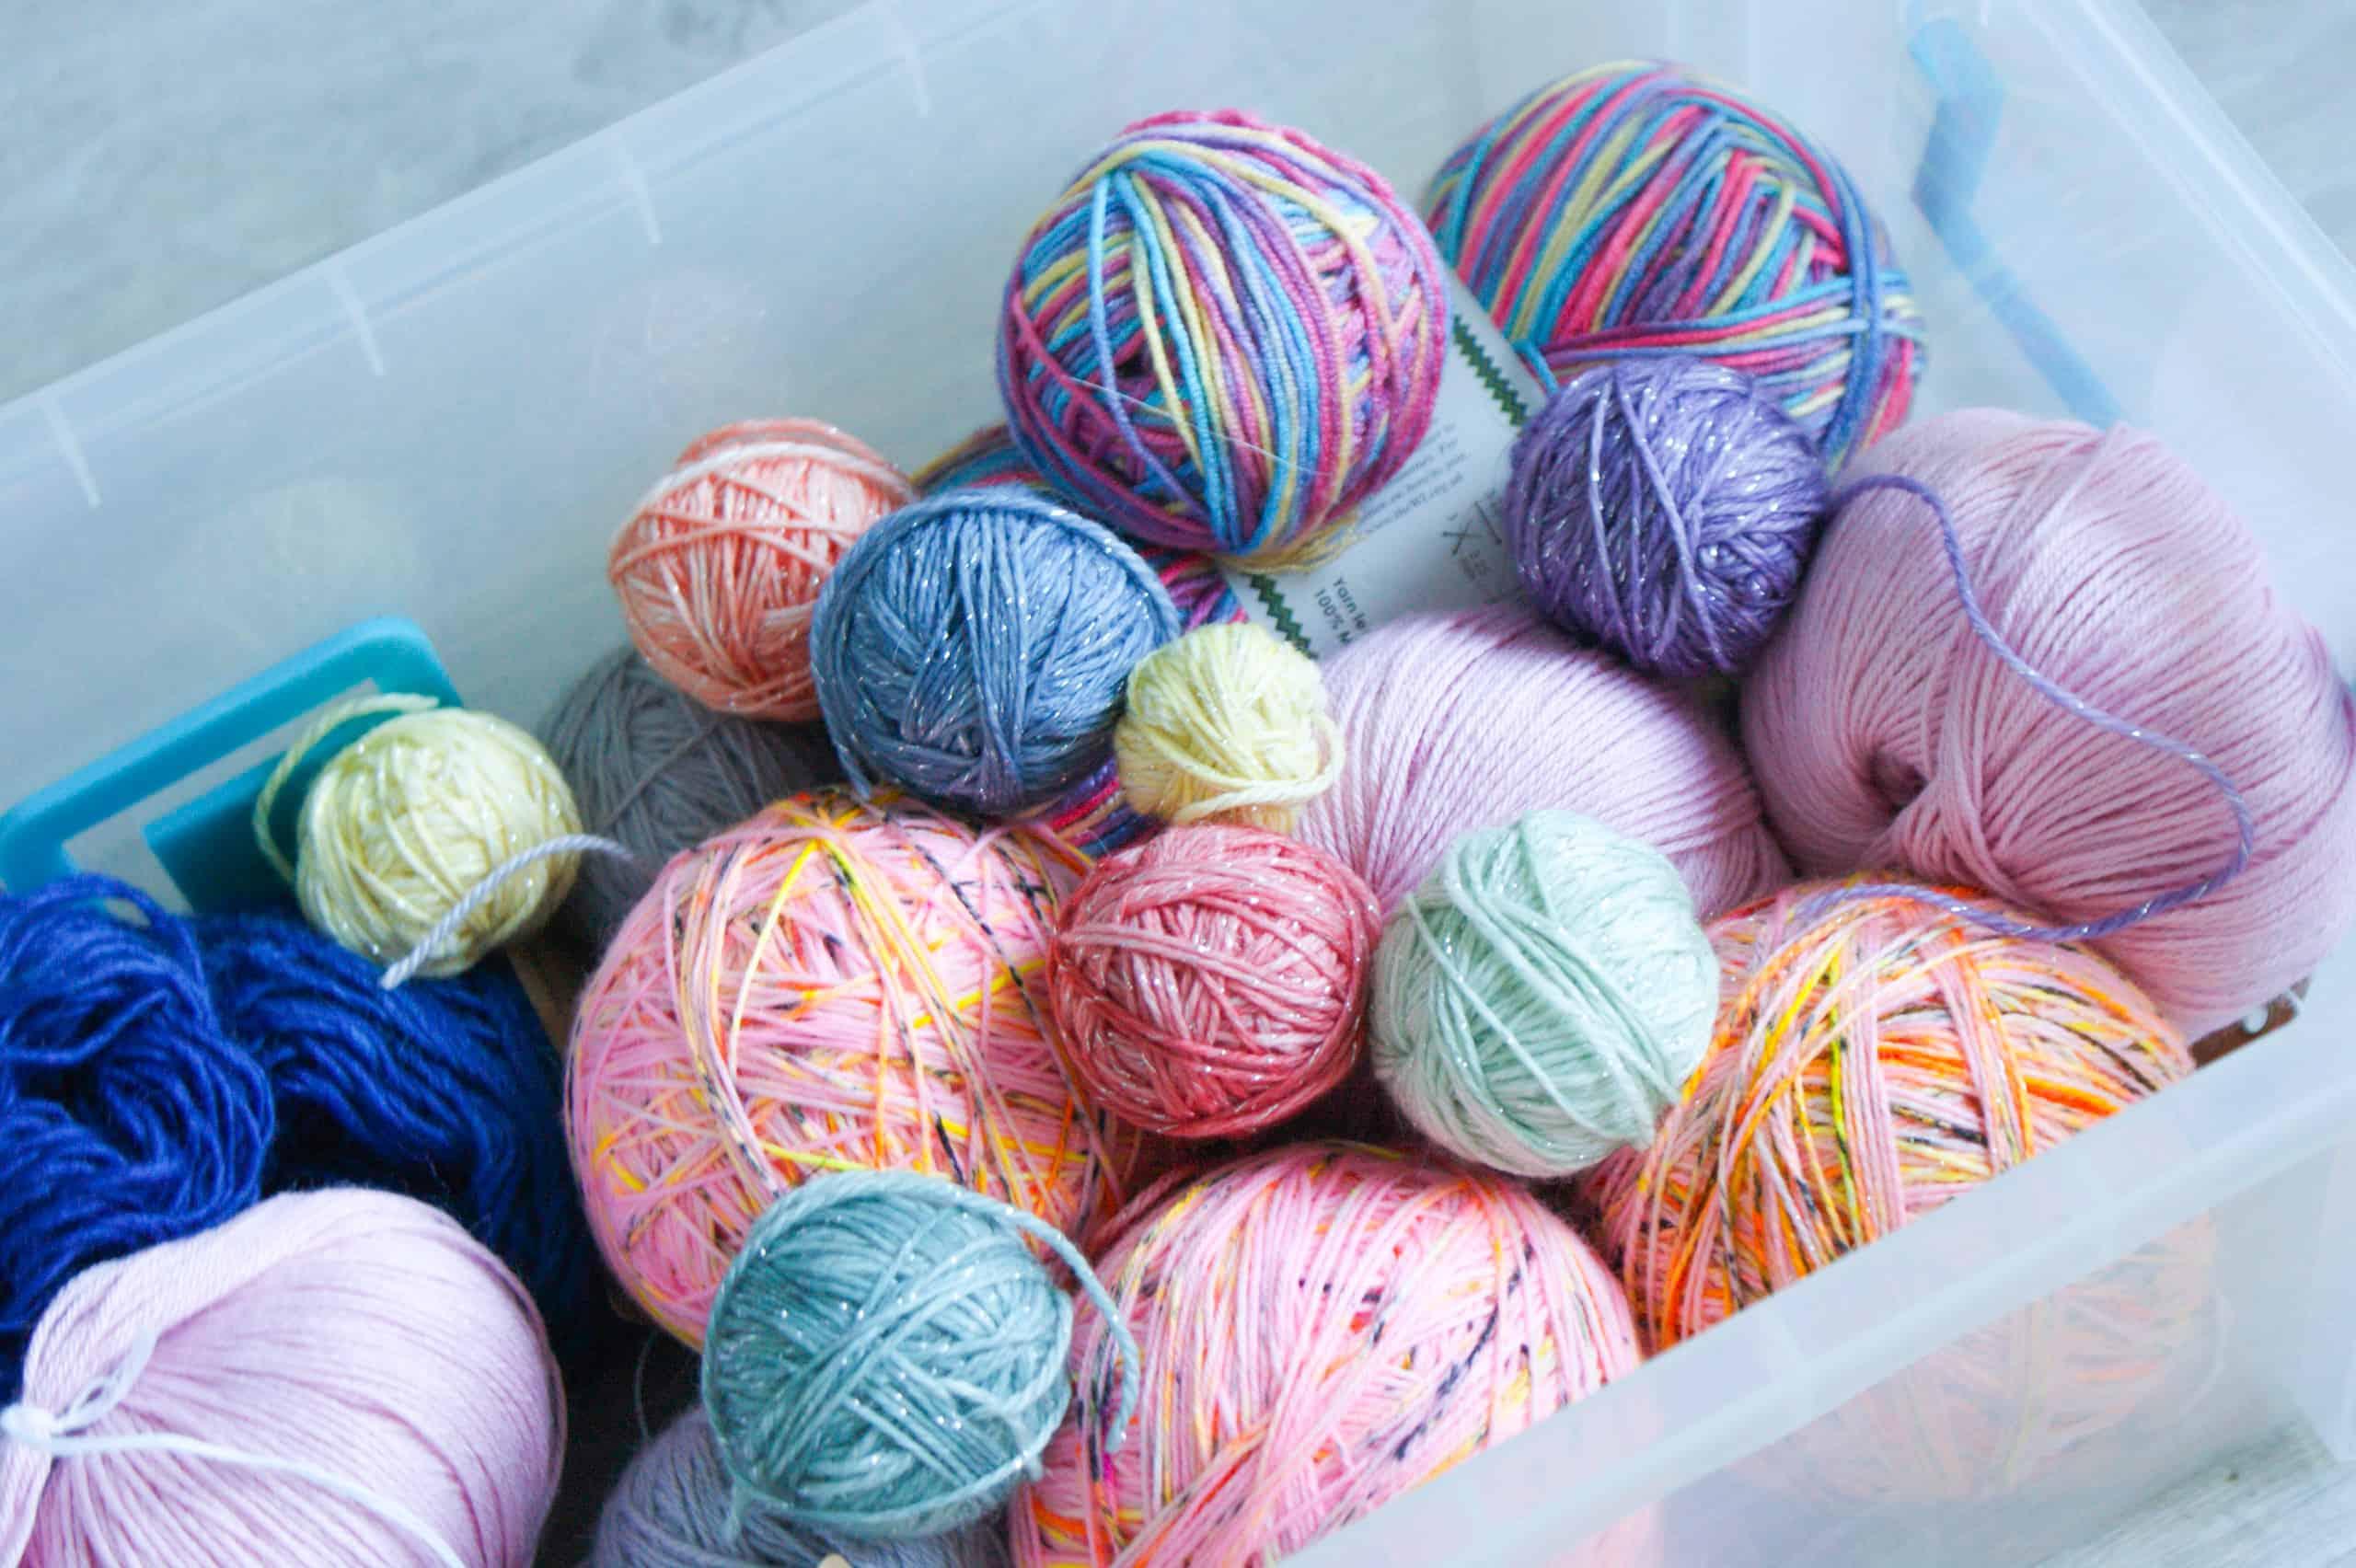 Multi coloured balls of yarn in a plastic storage box